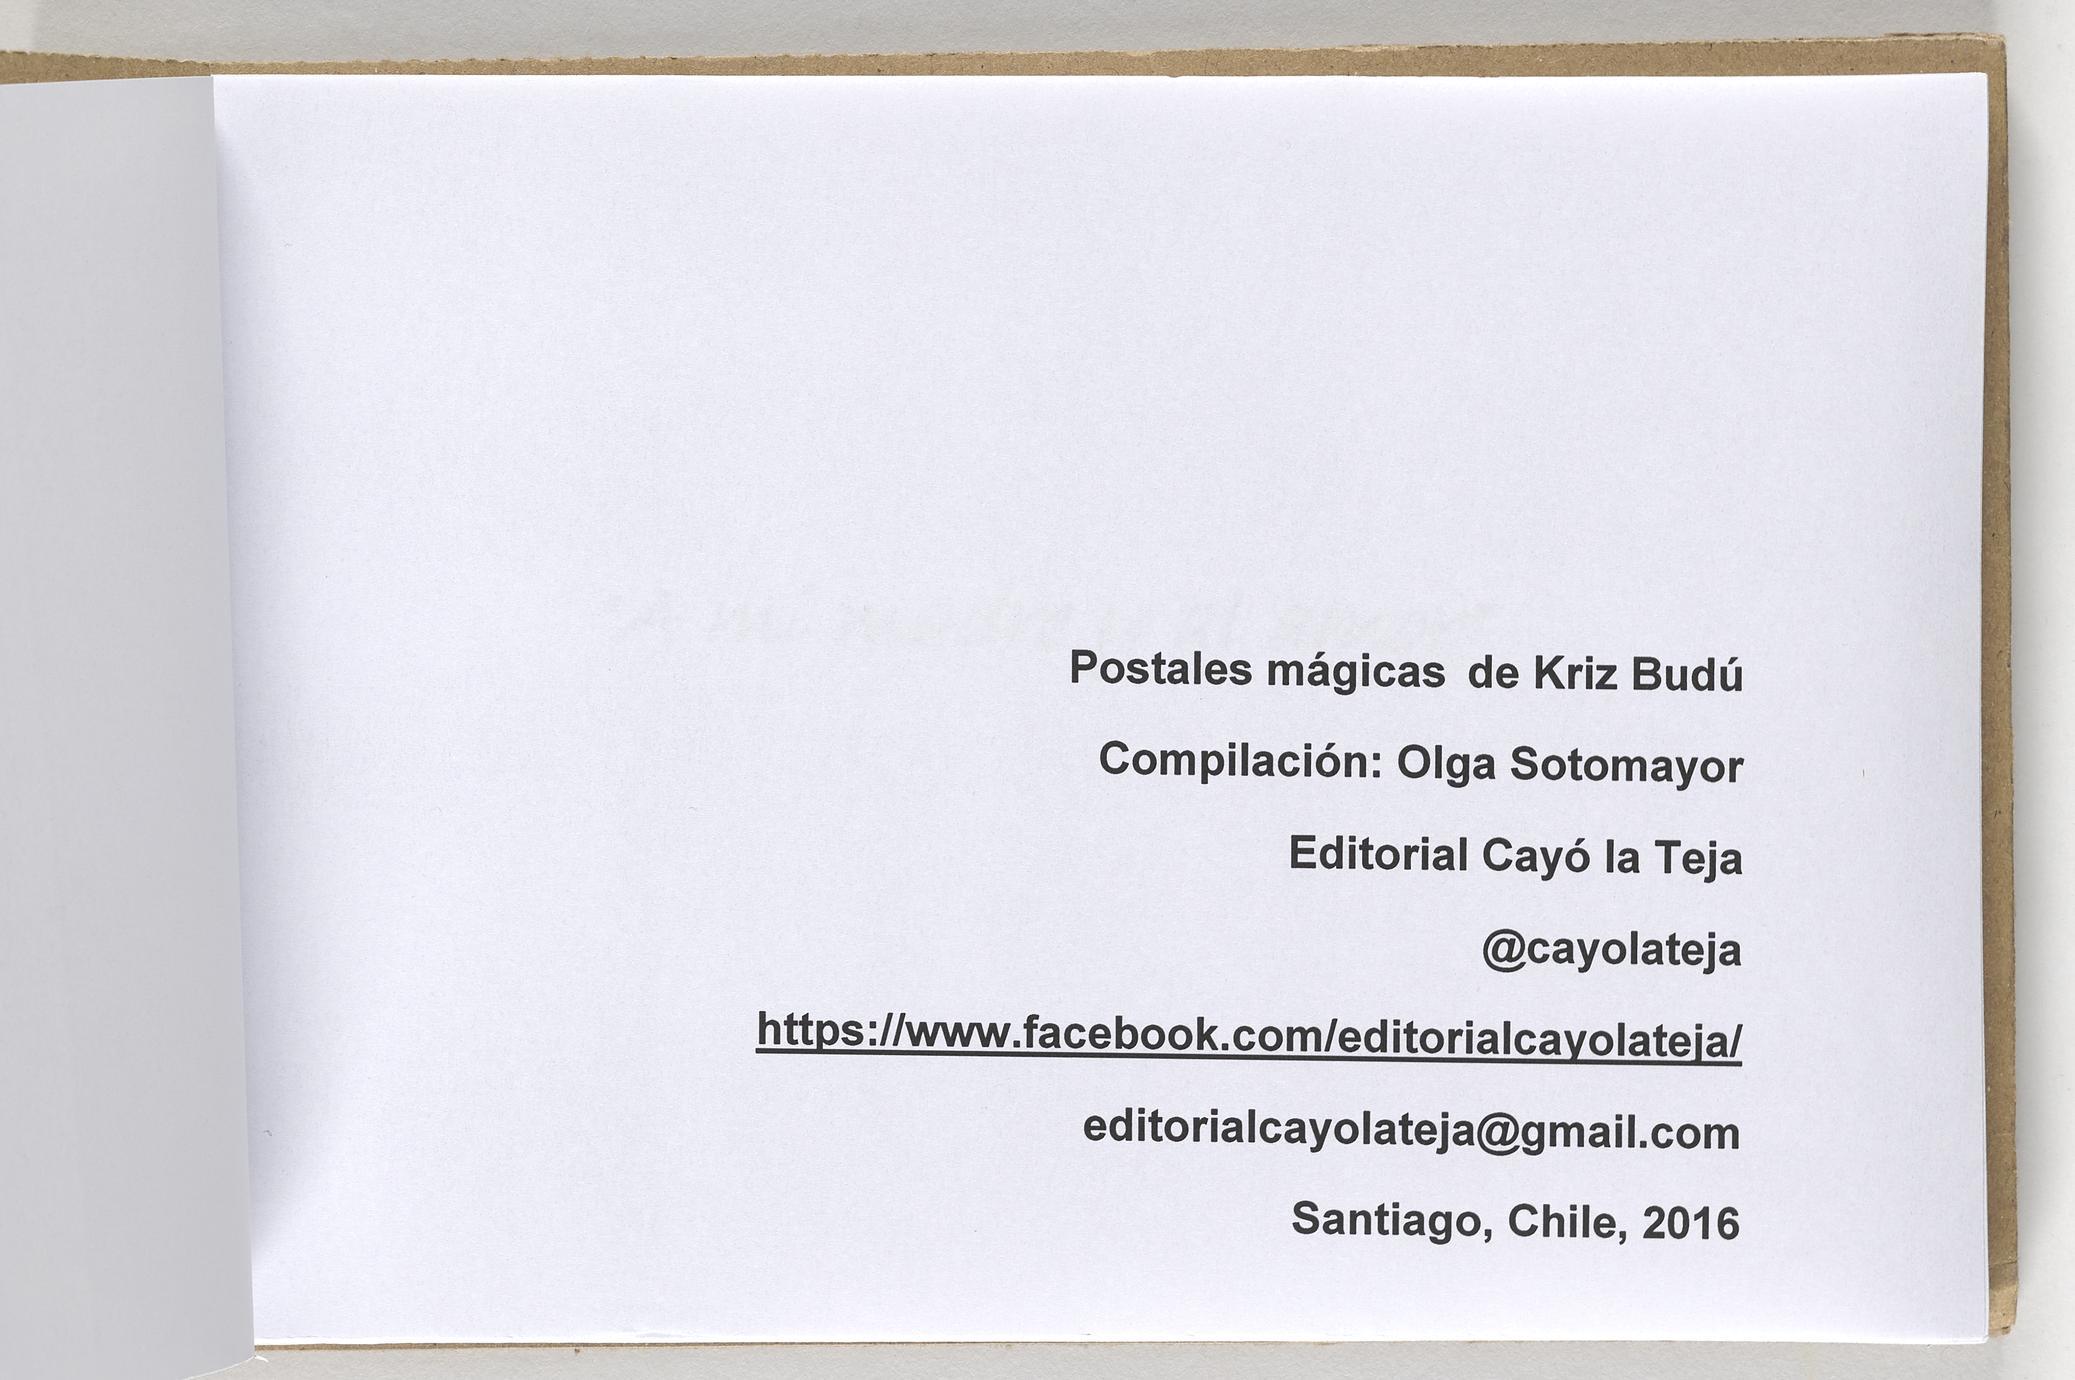 Postales mágicas (3 of 3)